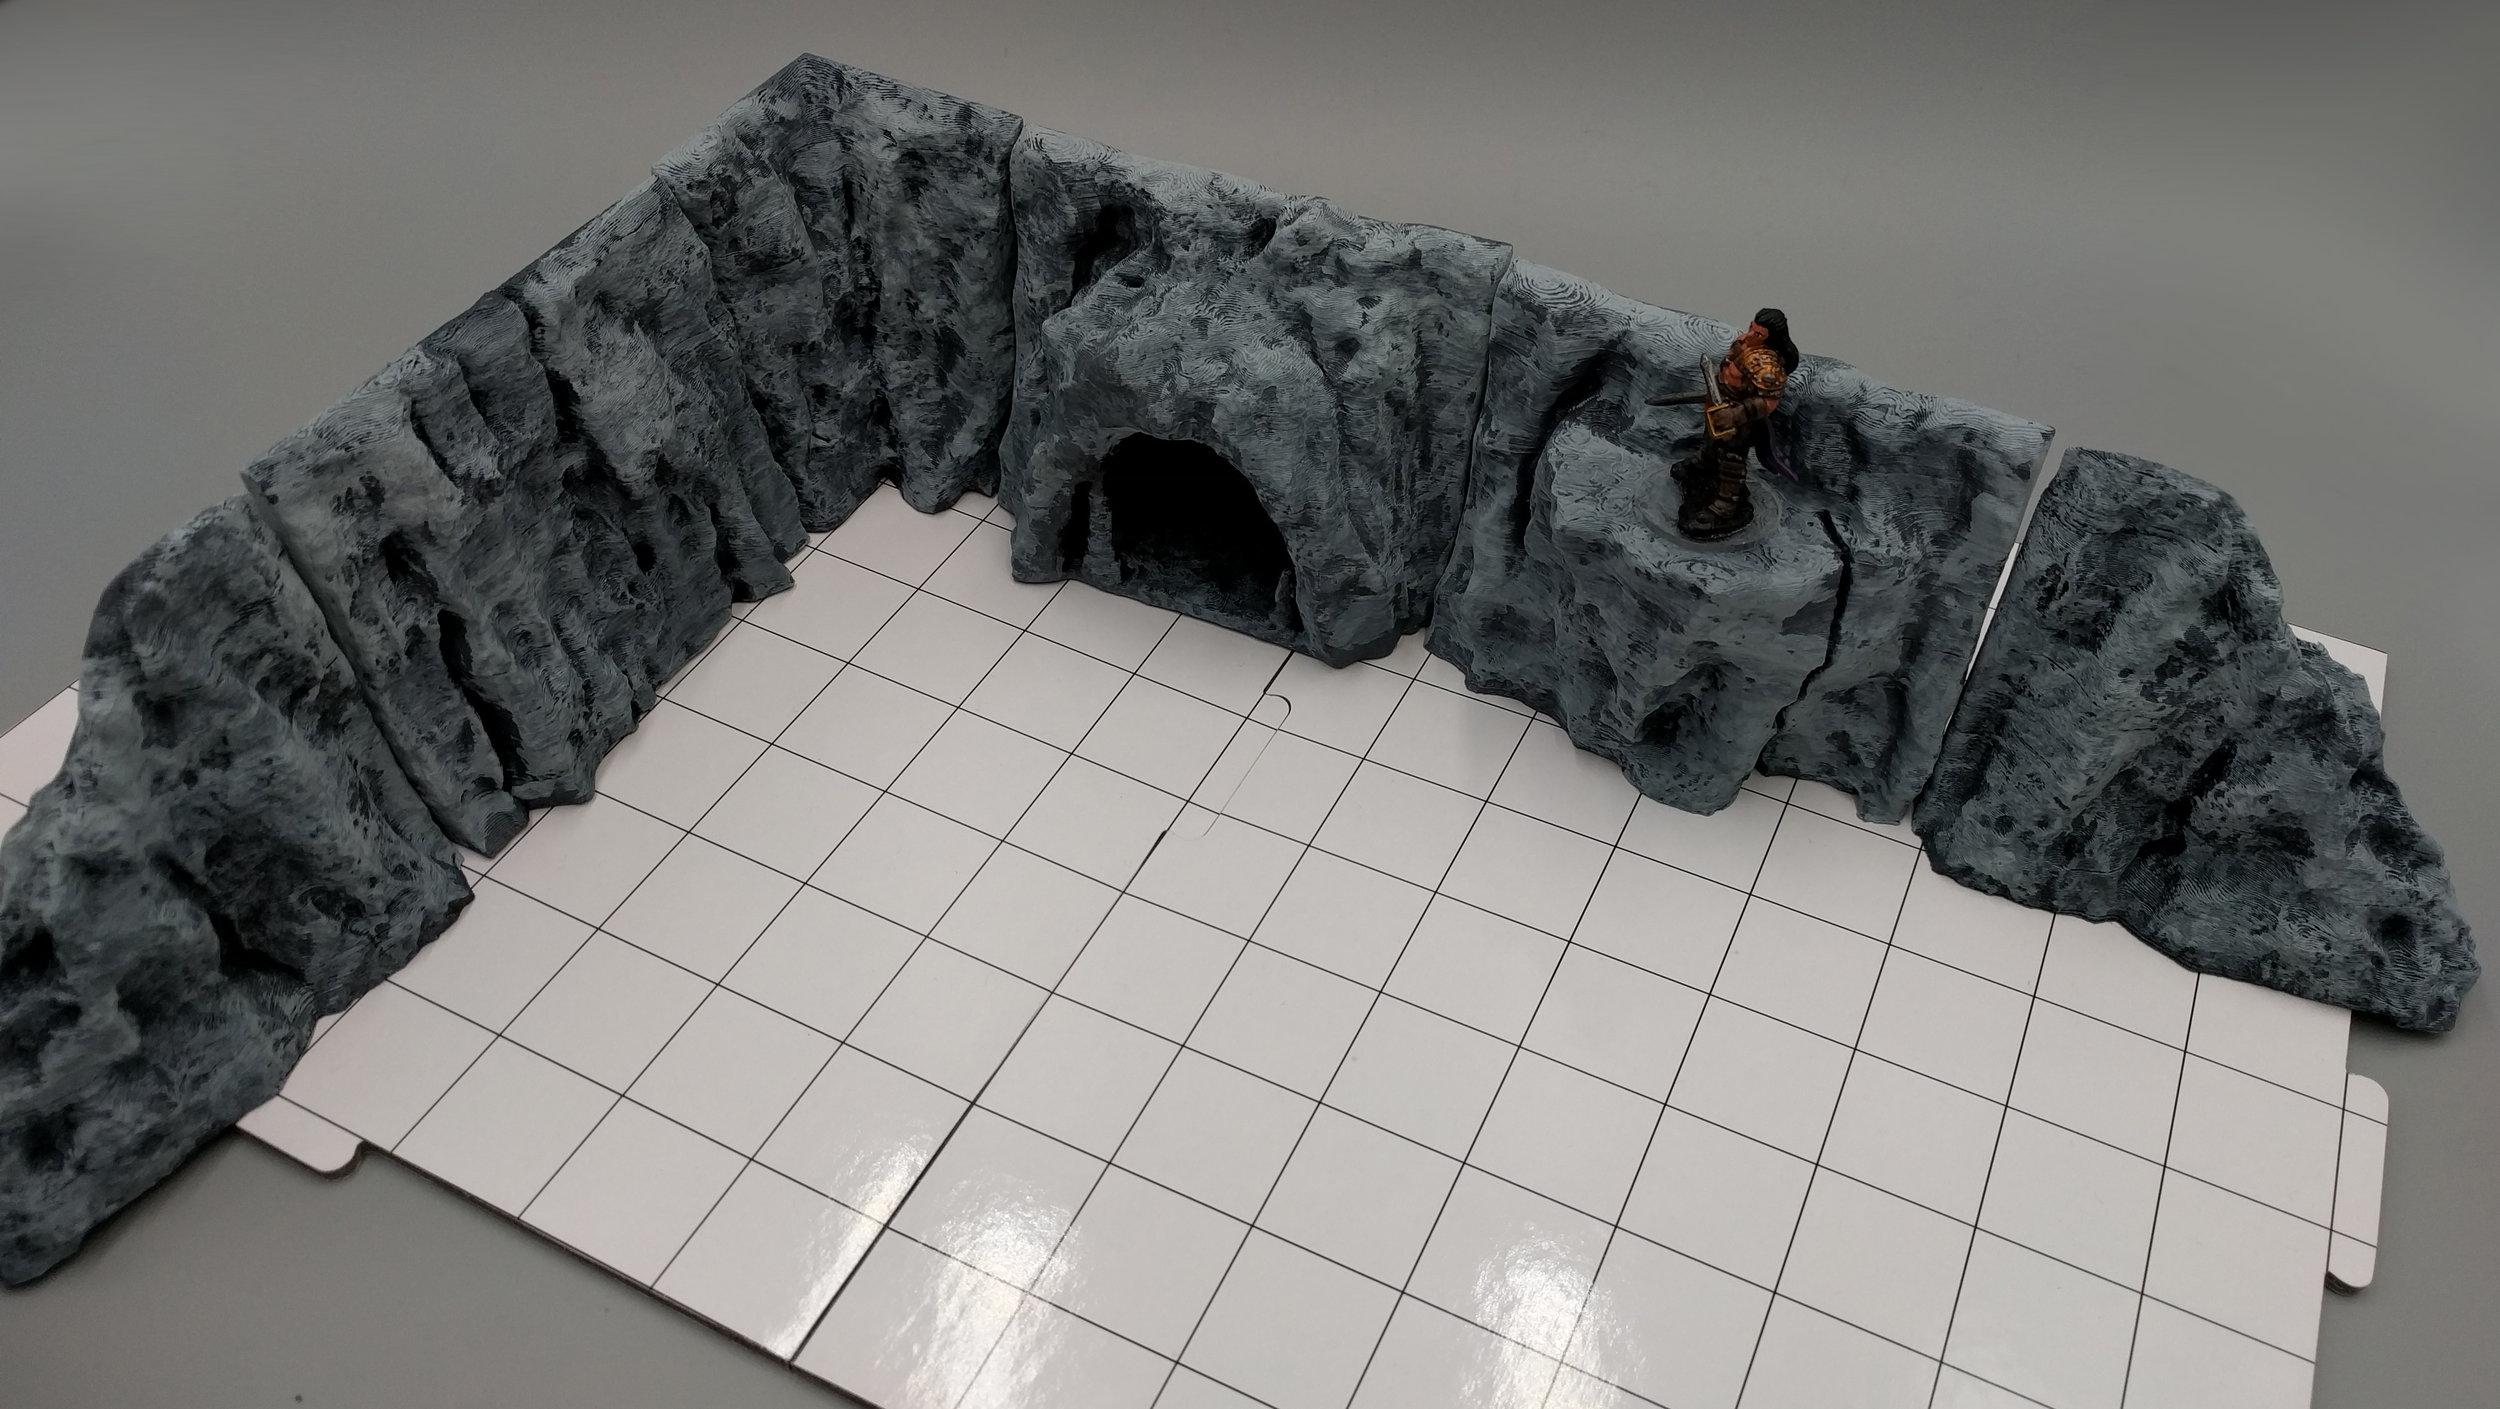 Cliffs4.jpg